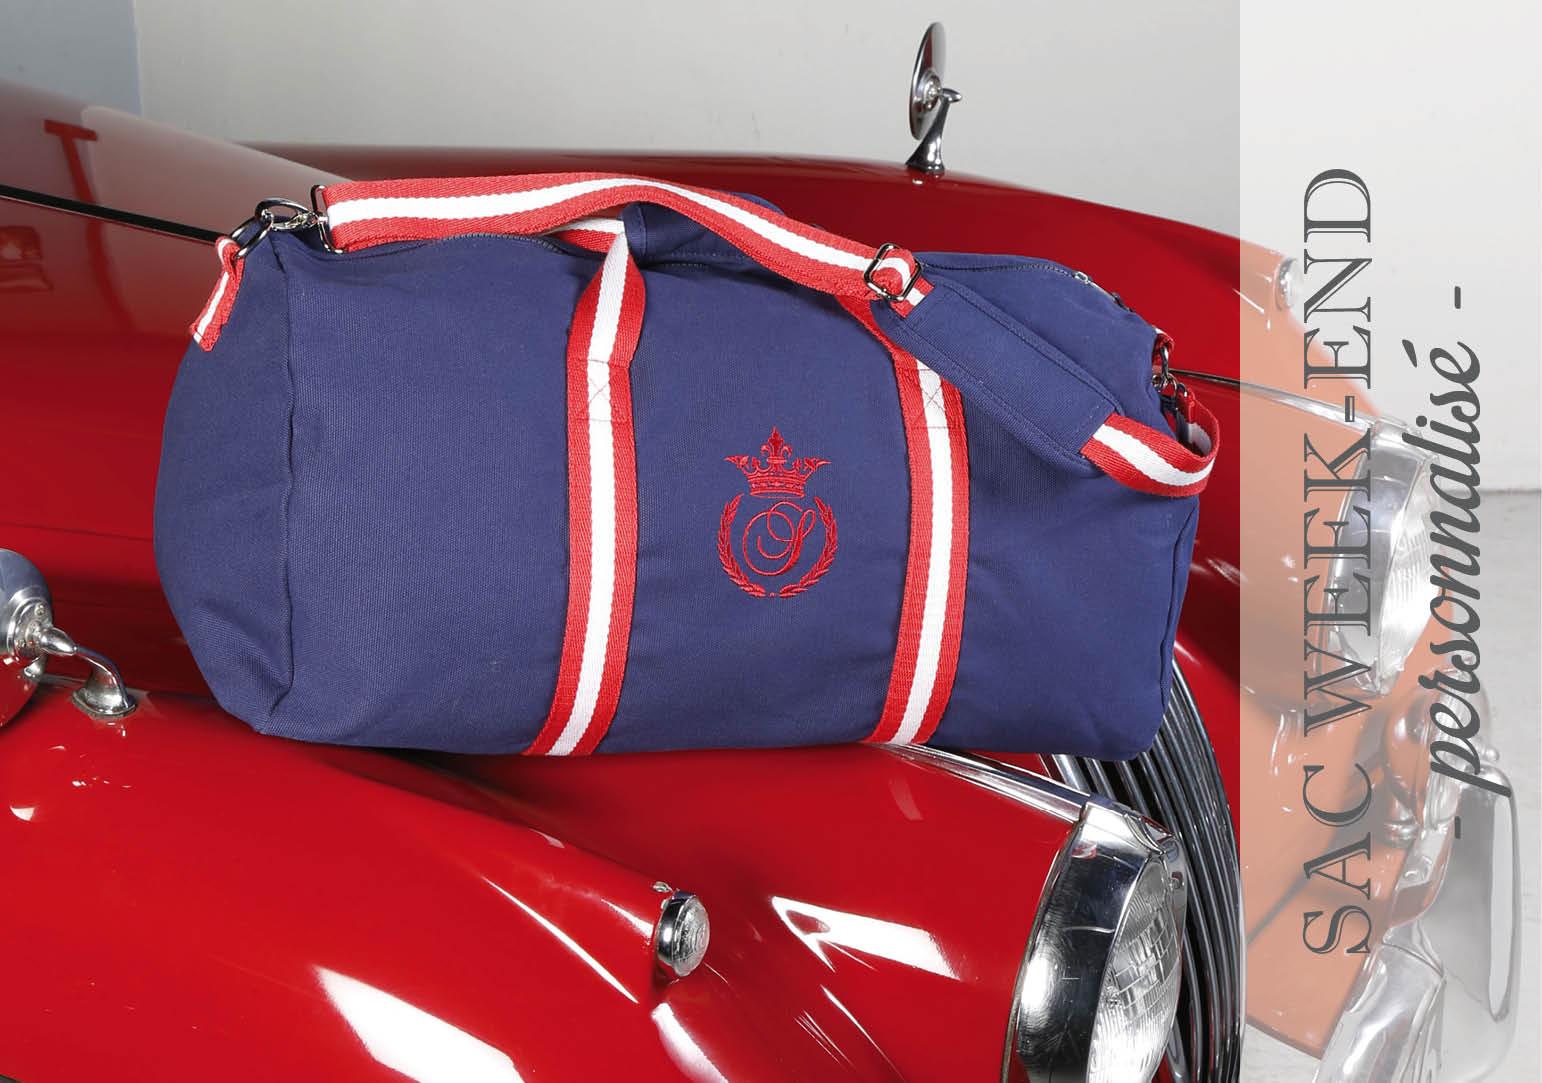 sac week-end personnalisé bleu marine et rouge by Matao